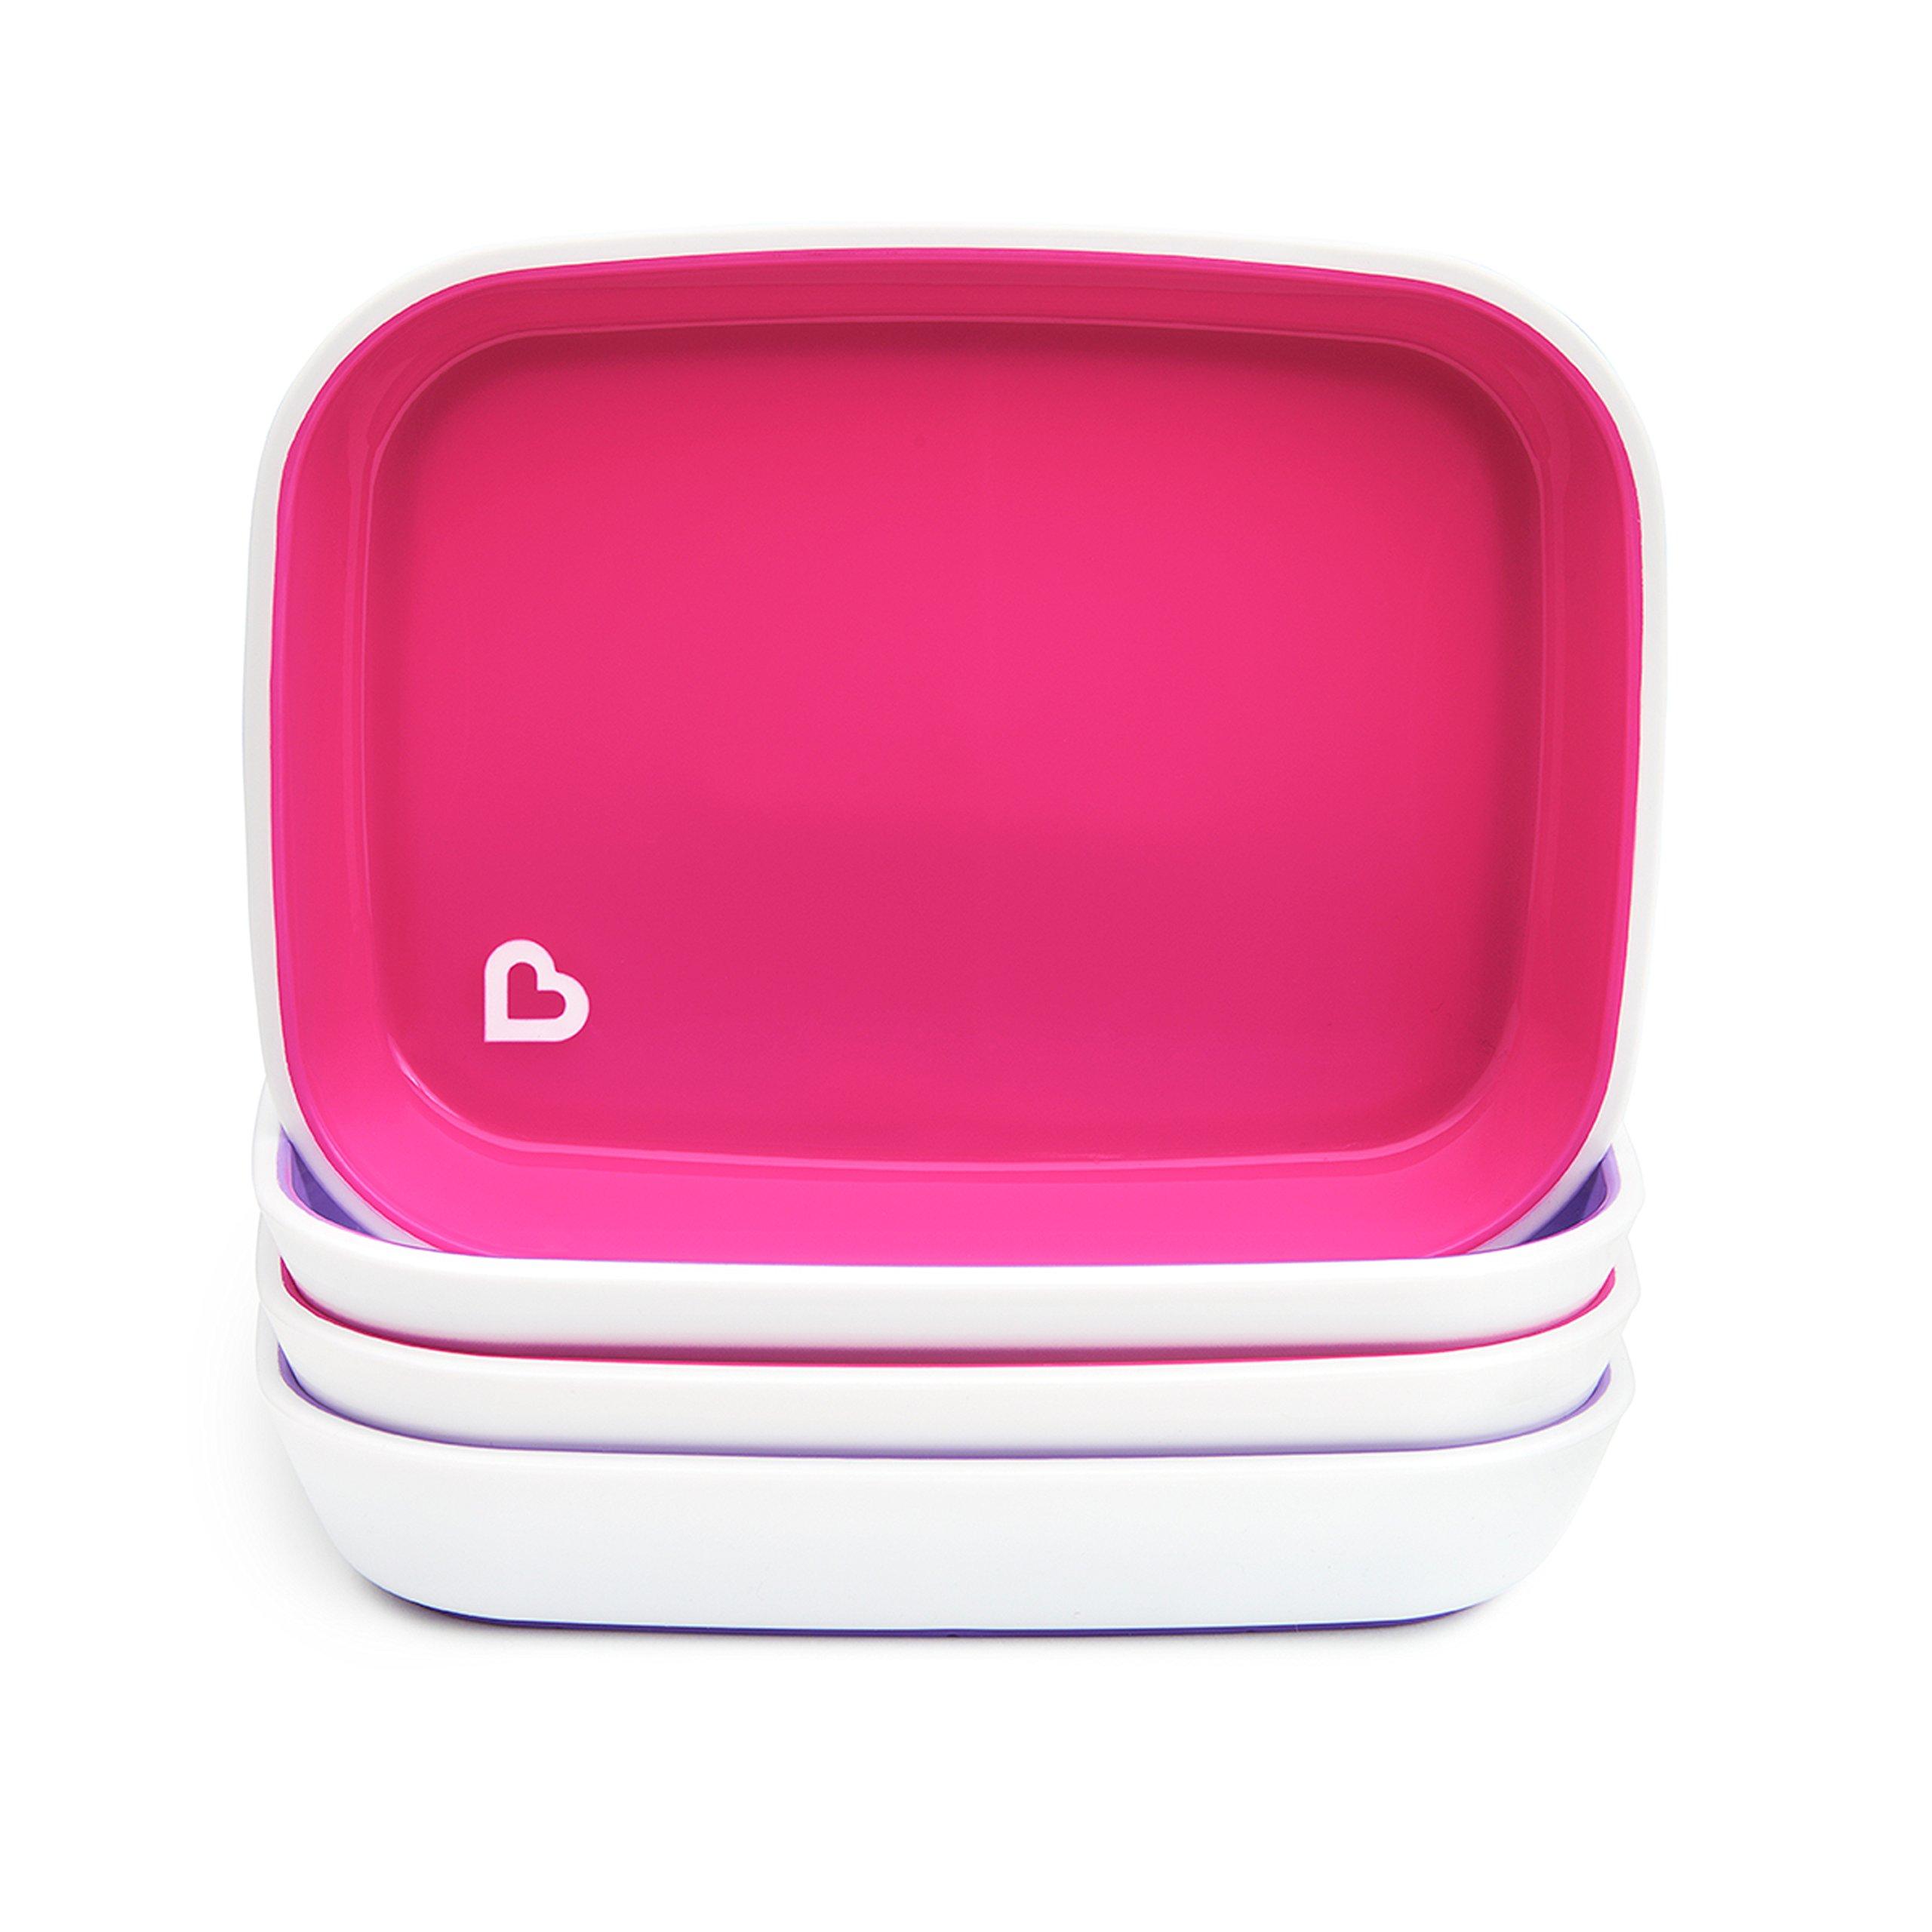 Munchkin Splash 4 Piece Toddler Plates, Pink/Purple